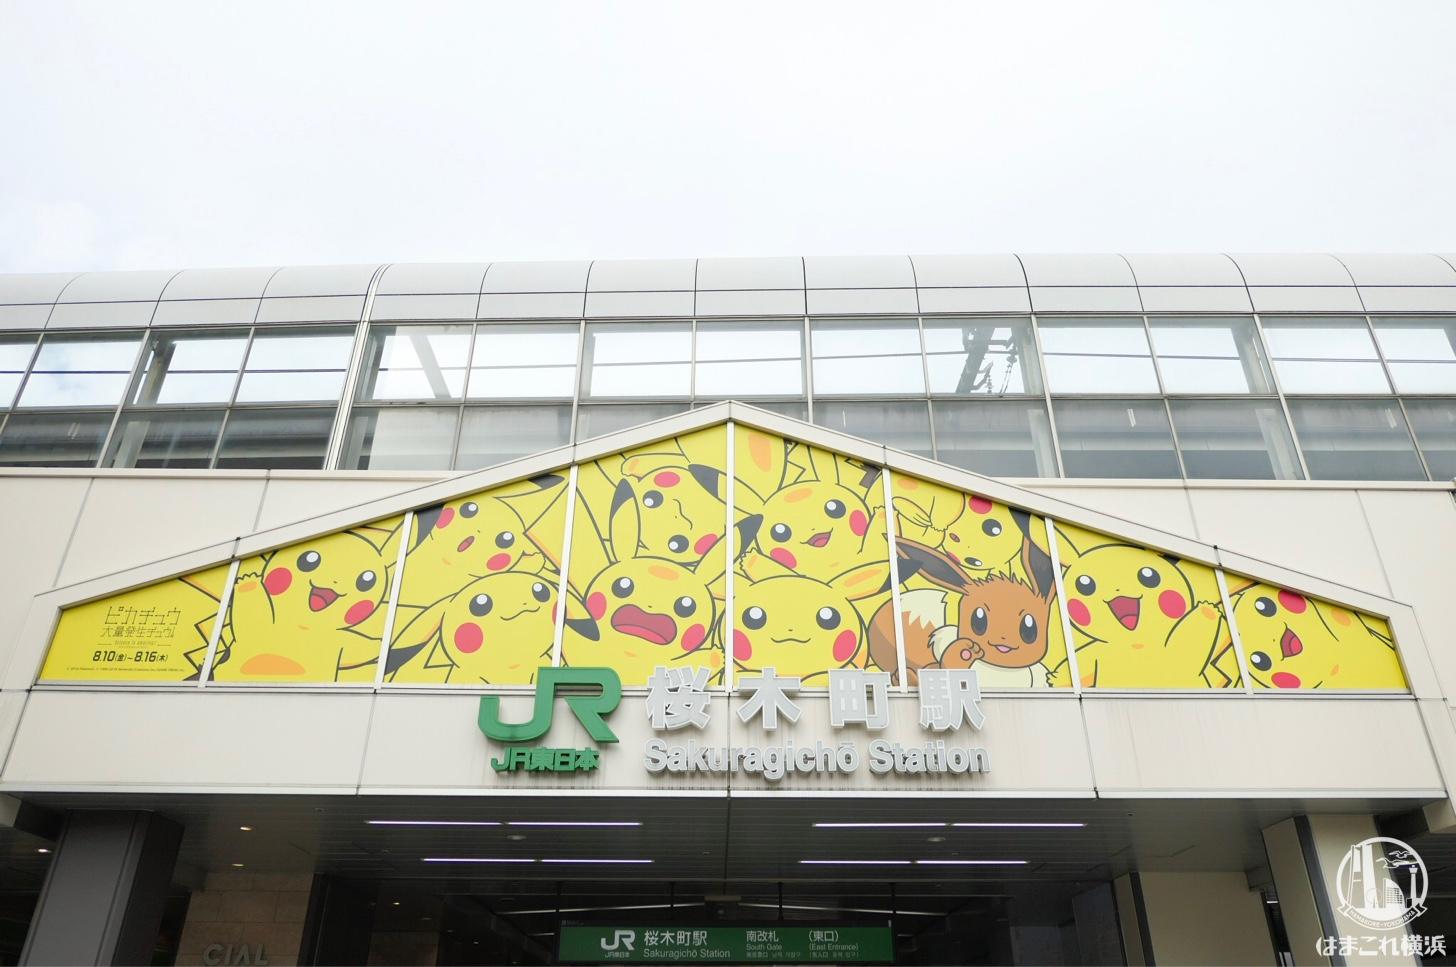 JR桜木町駅 屋外ガラス壁面のピカチュウとイーブイ